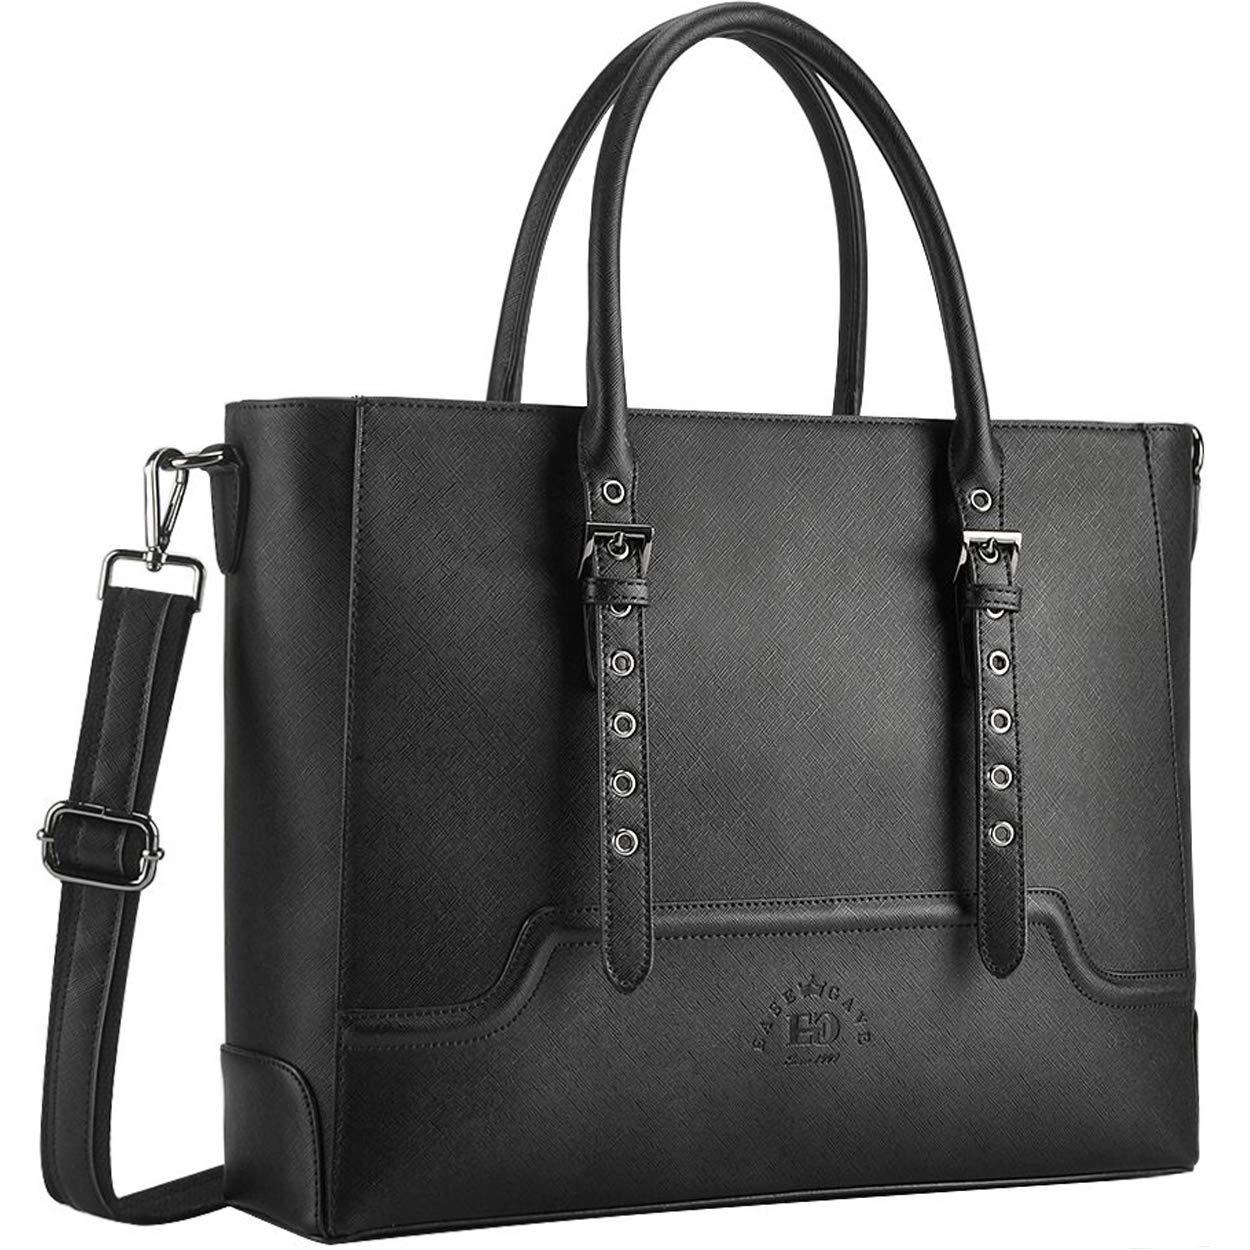 Tote Handbags with Drawstring, PU Leather Designer Handbags Tote Bag for Women Girls Laptop Bag for Women EaseGave